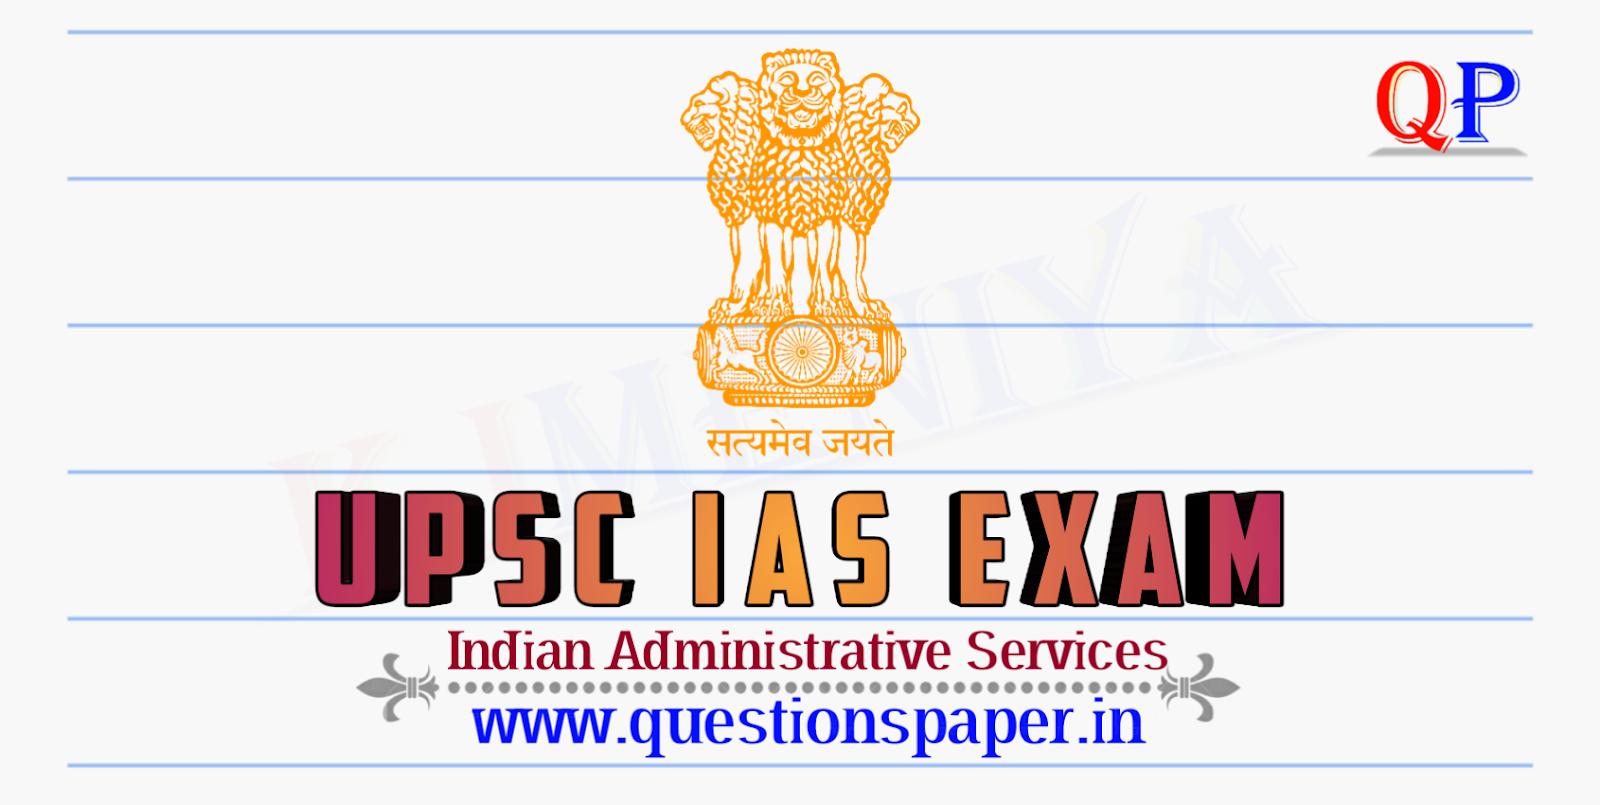 UPSC Civil Services (Preliminary) GS Question Paper 02-06-2019